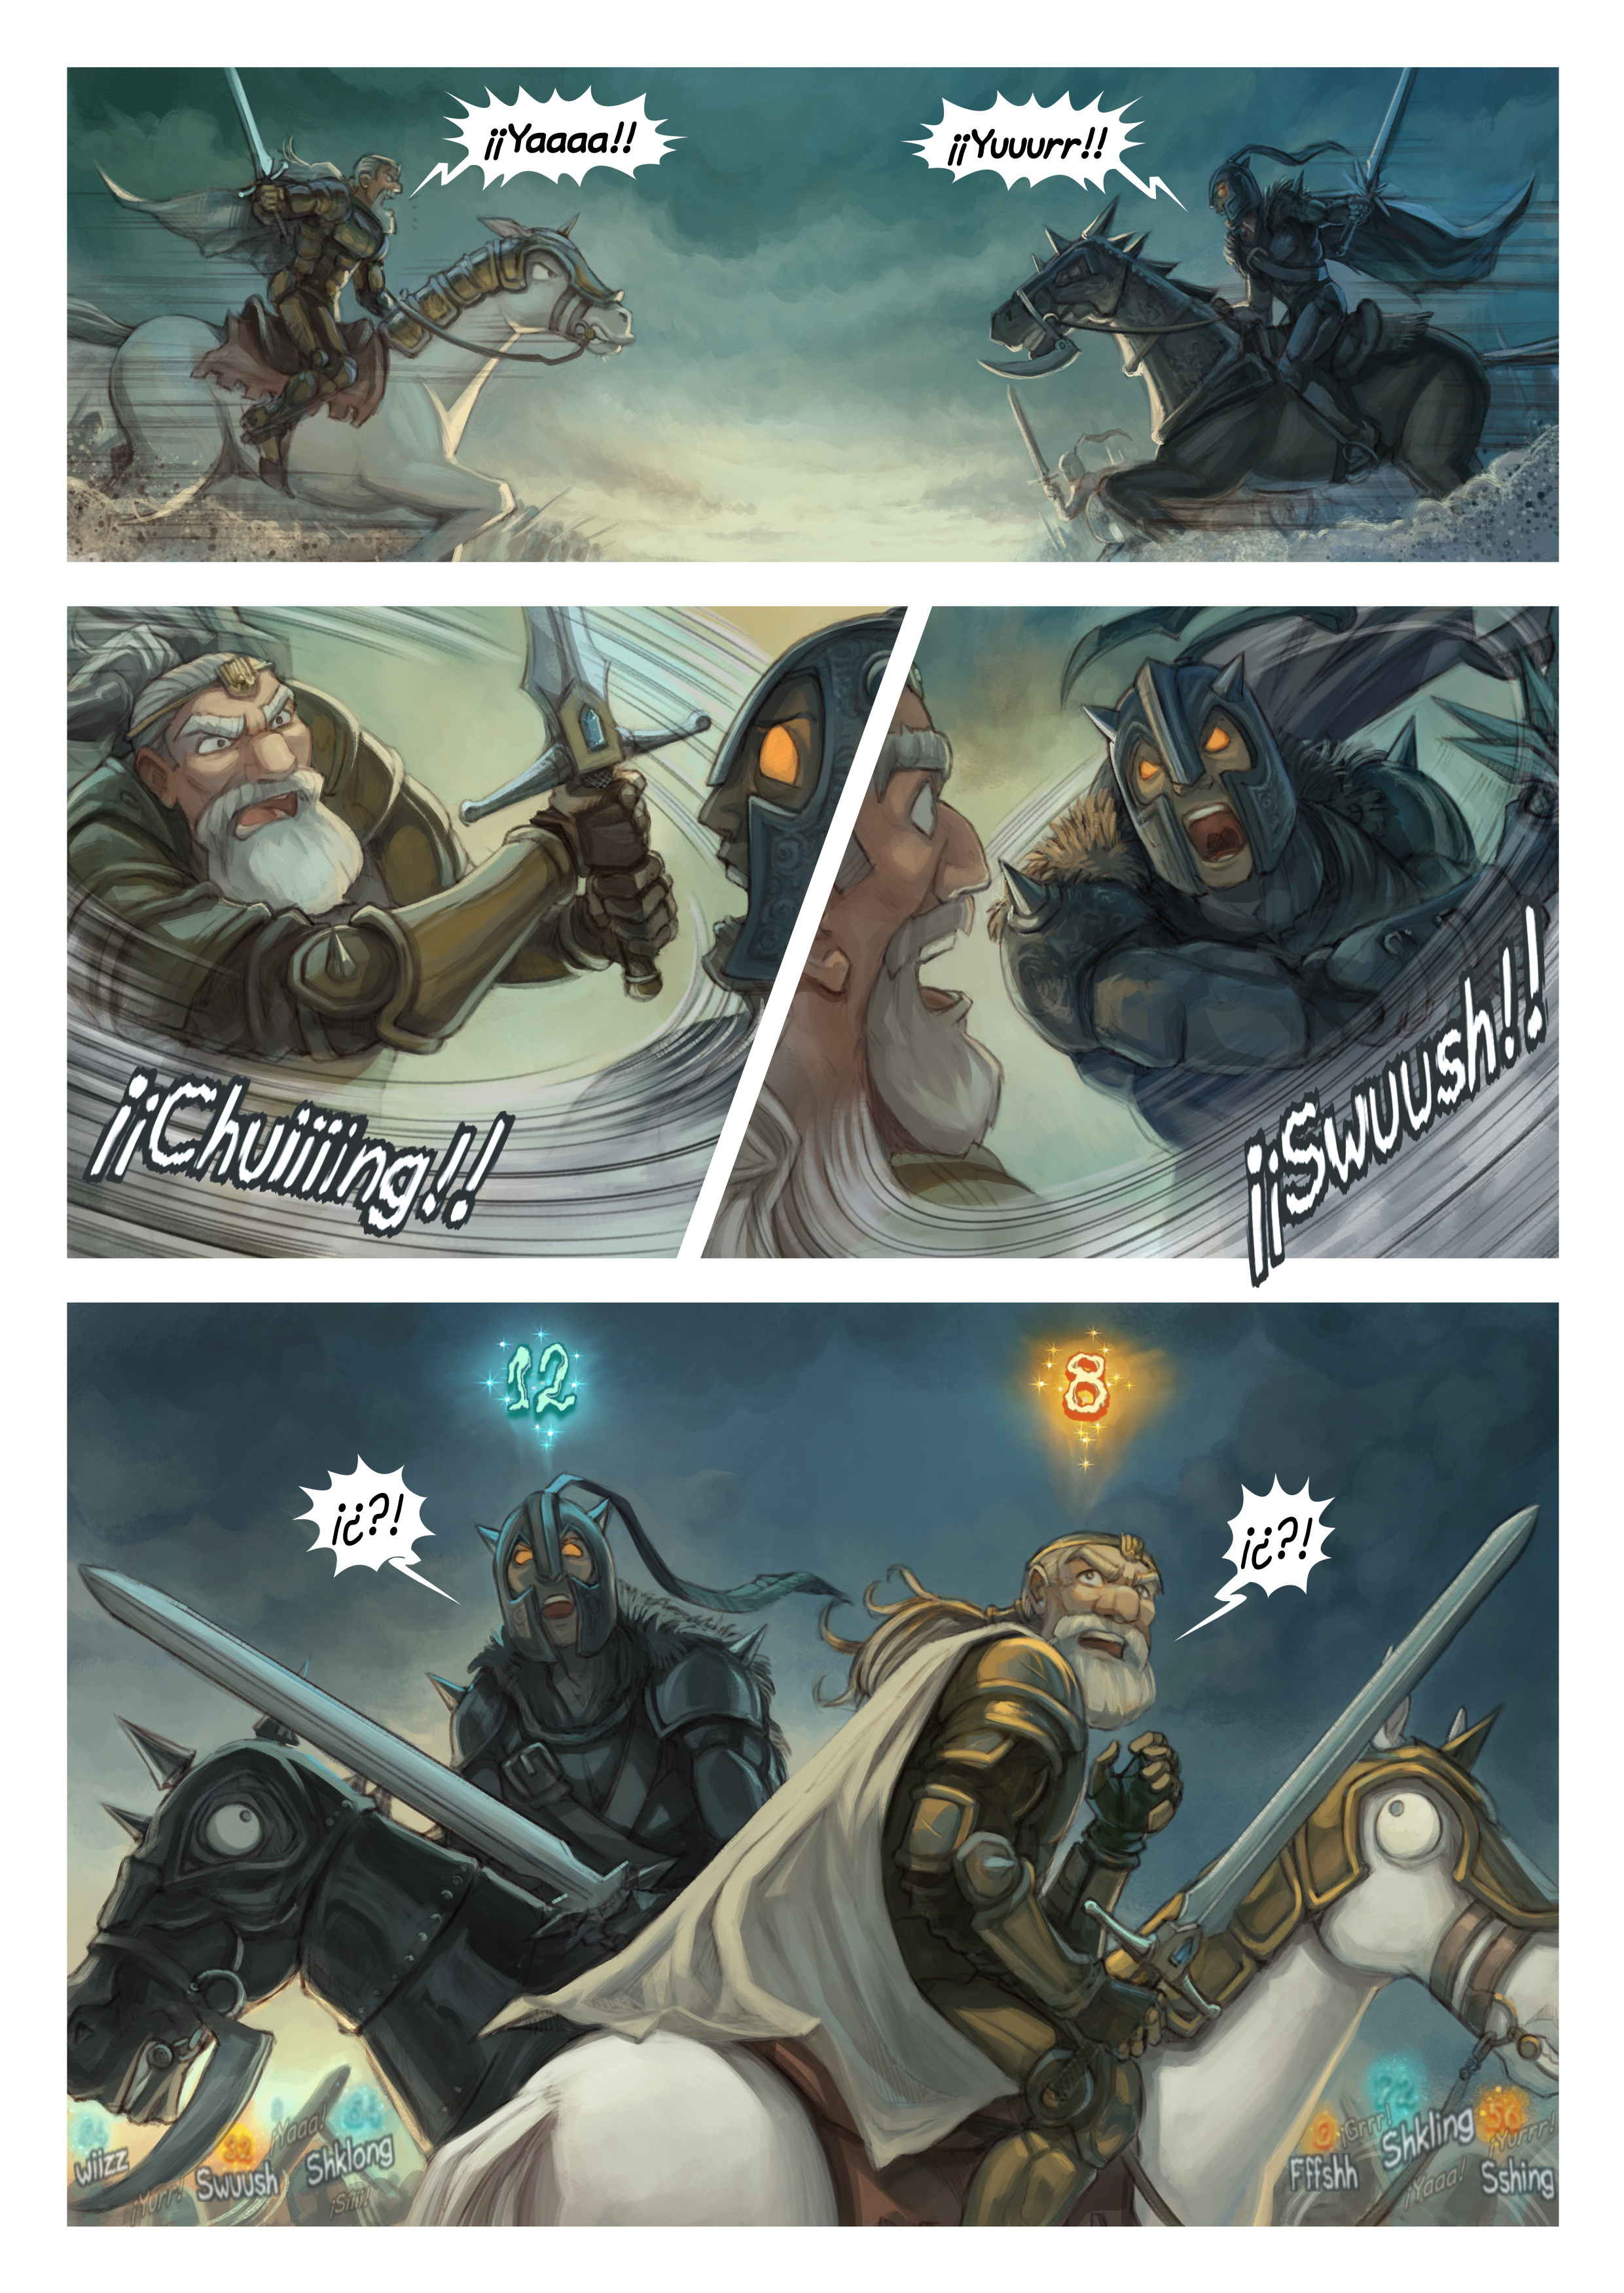 Episodio 33: Hechizo de guerra, Page 5